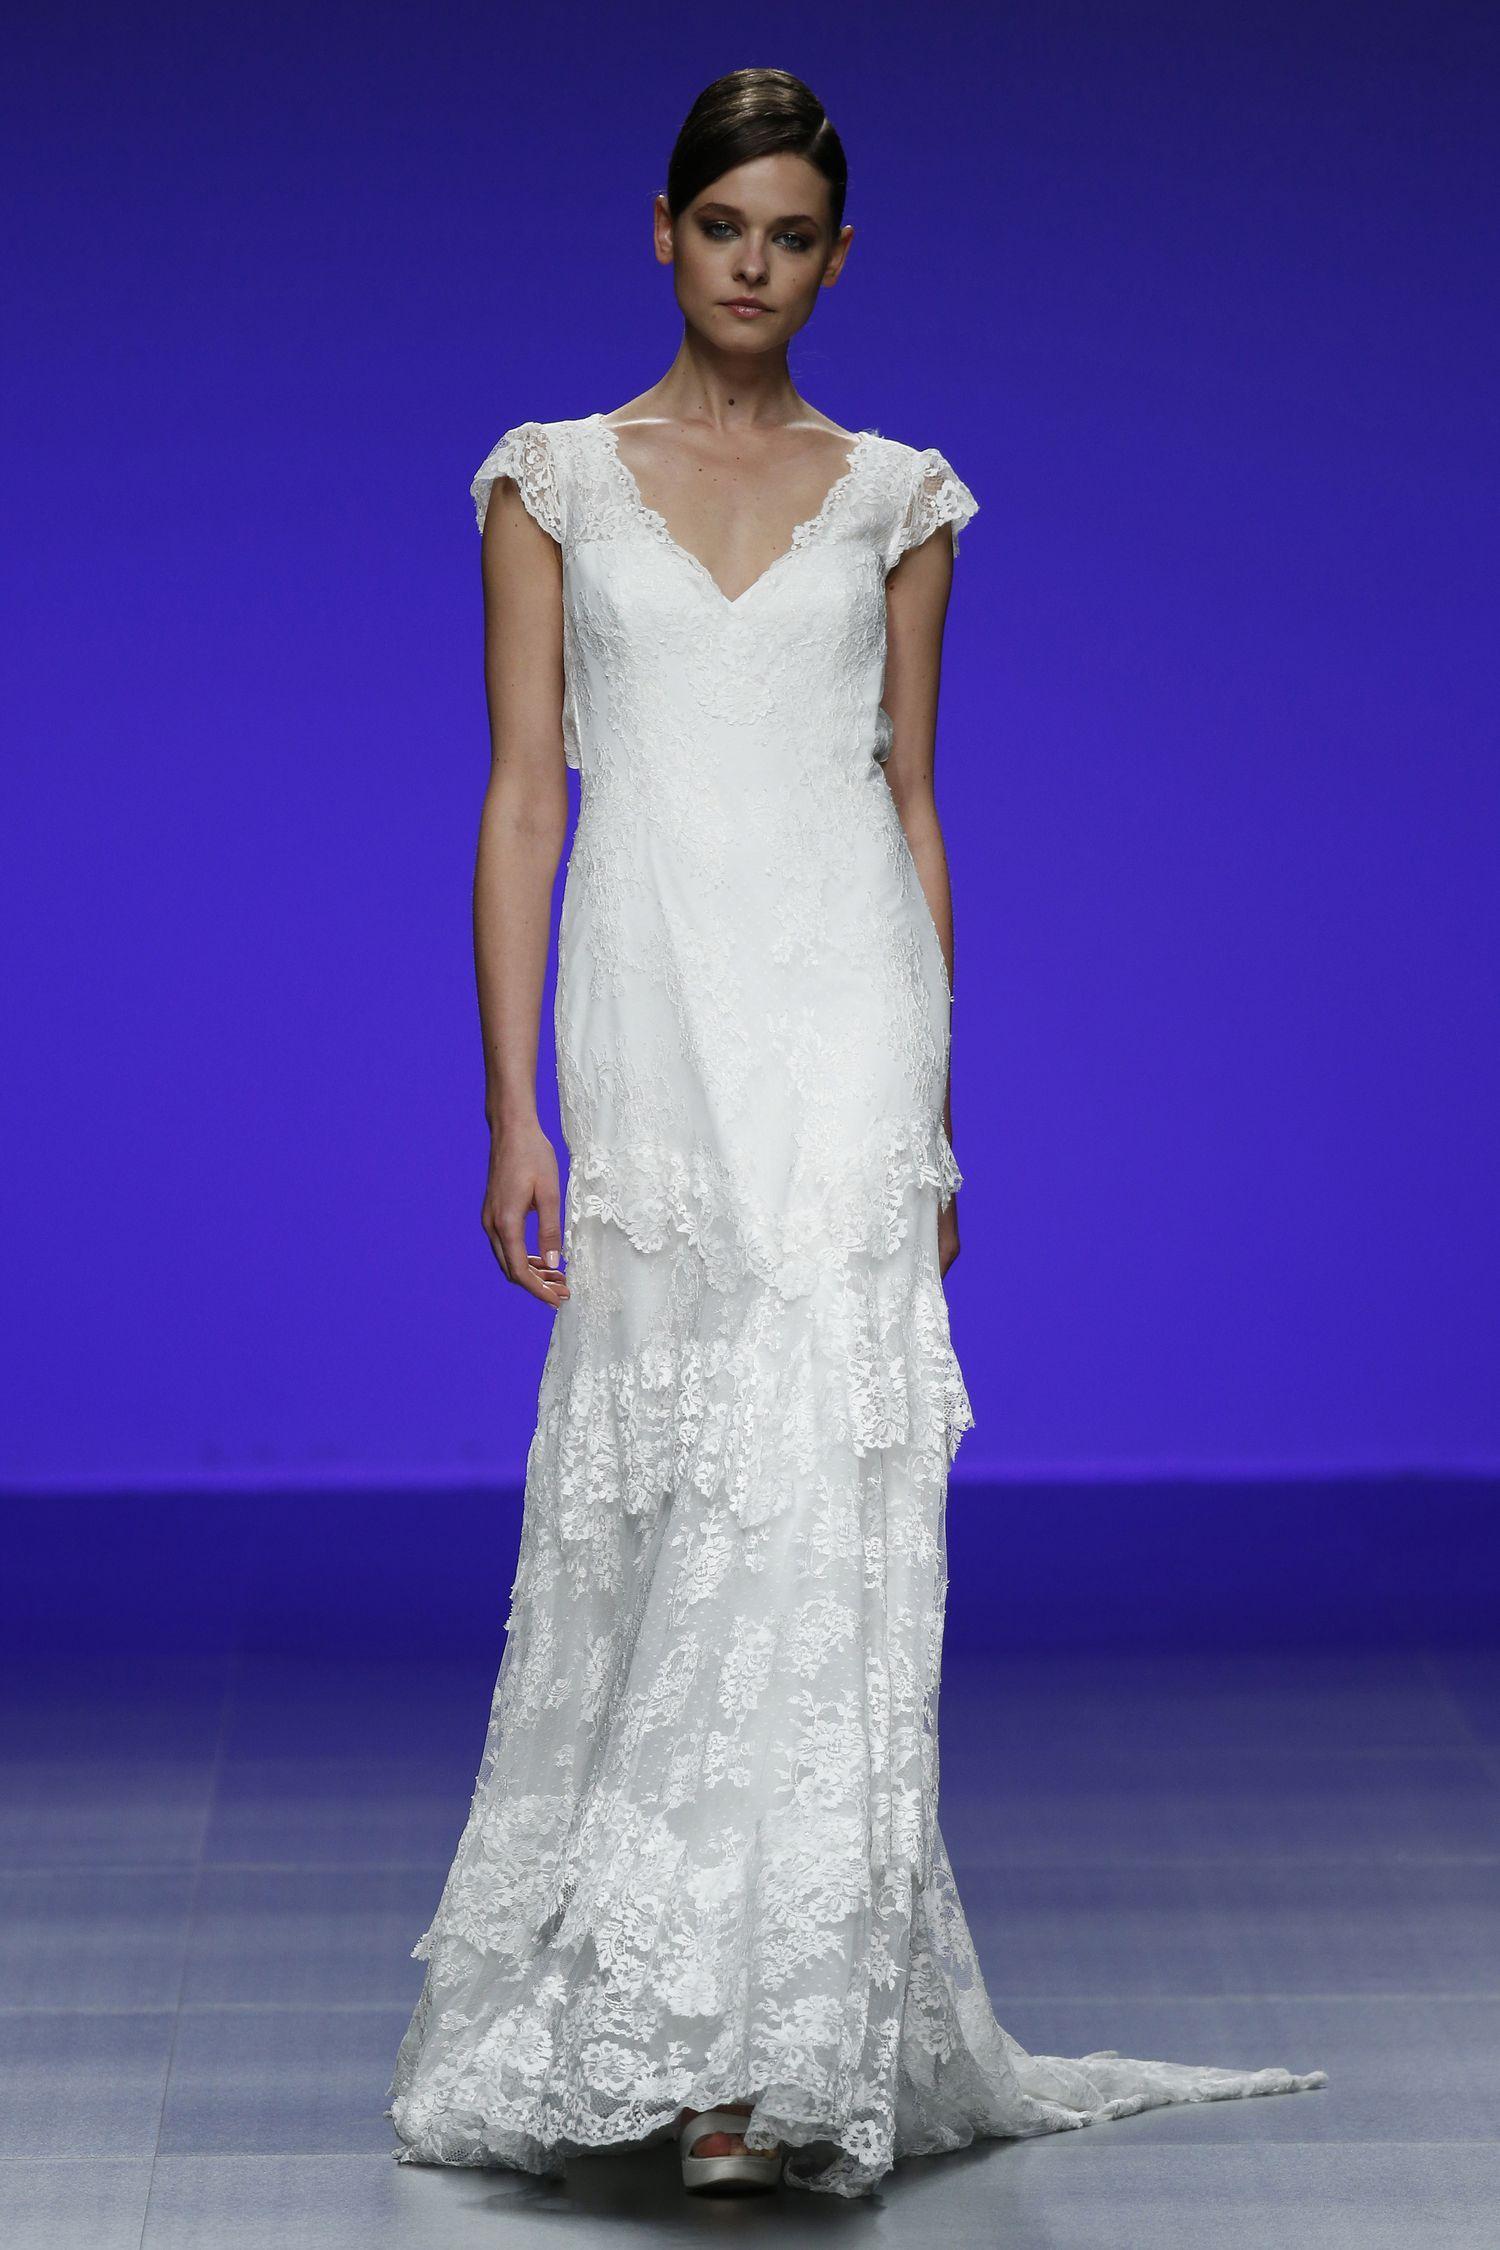 Kuvahaun tulos haulle indulgence cymbeline | The Wedding dress ...